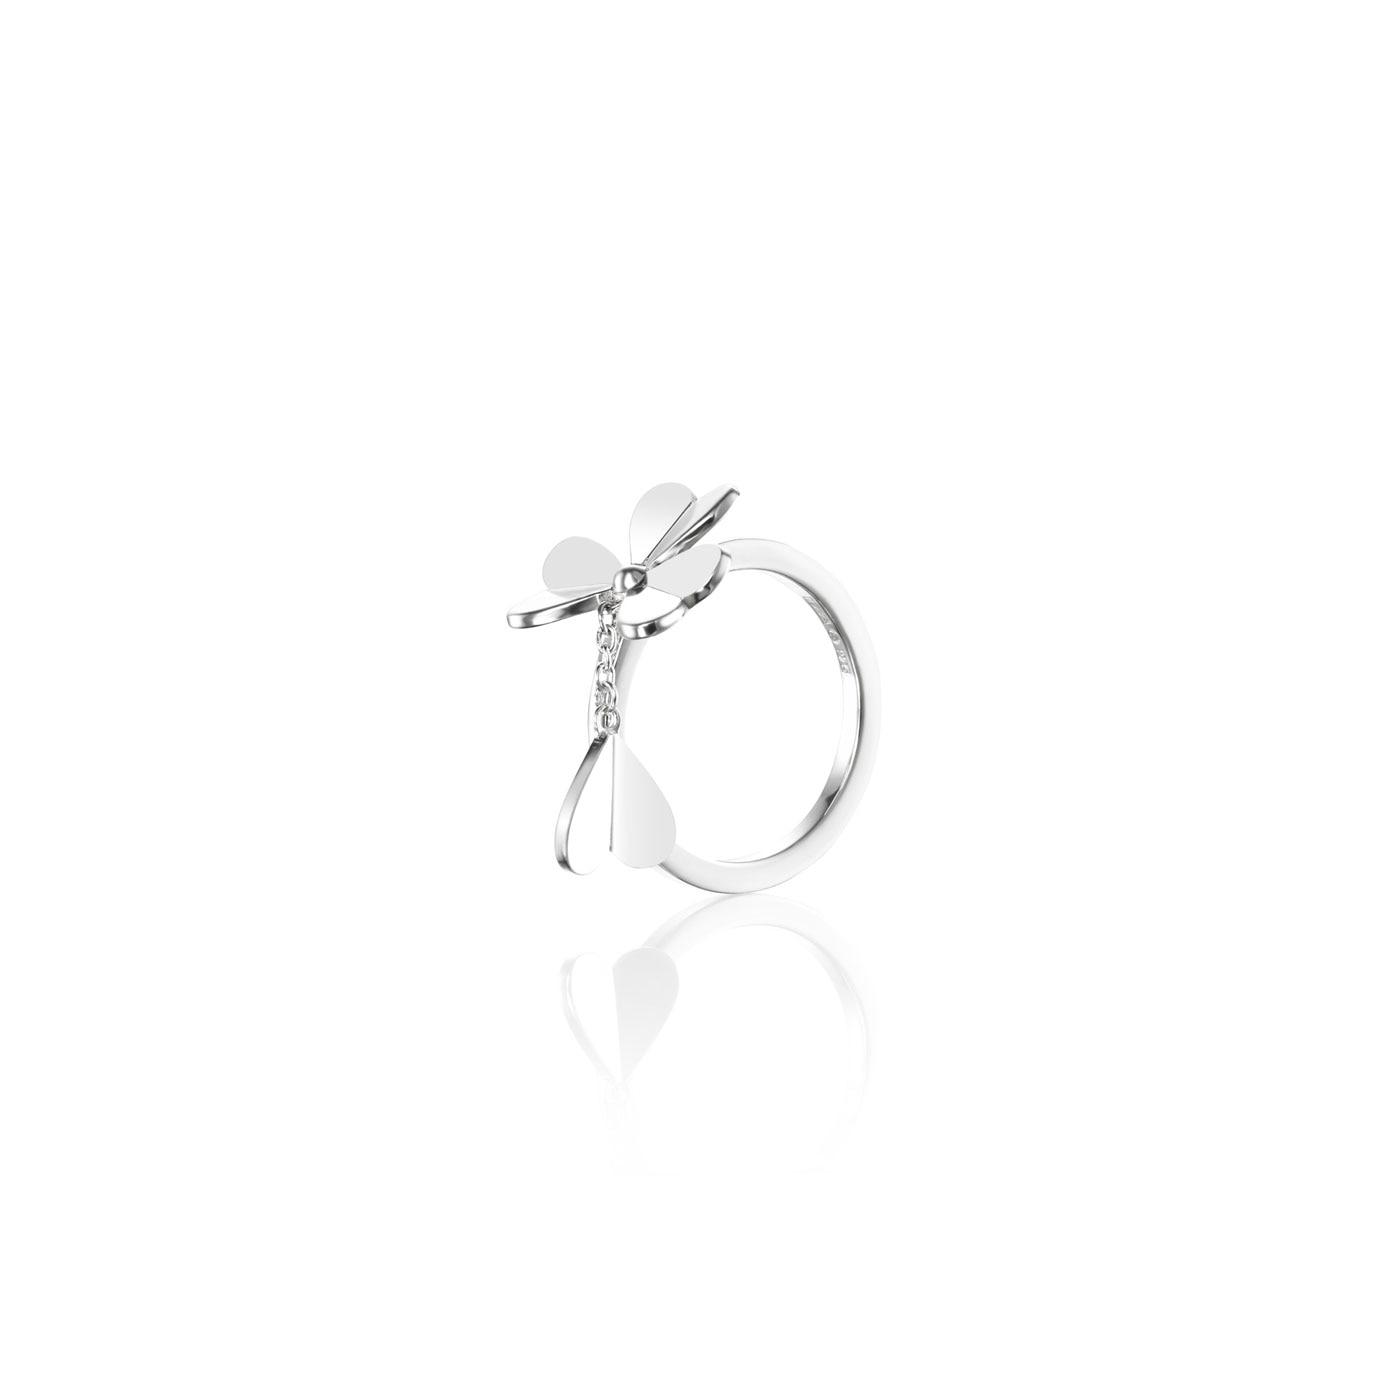 Four-Clover-Ring-13-100-01598(1)